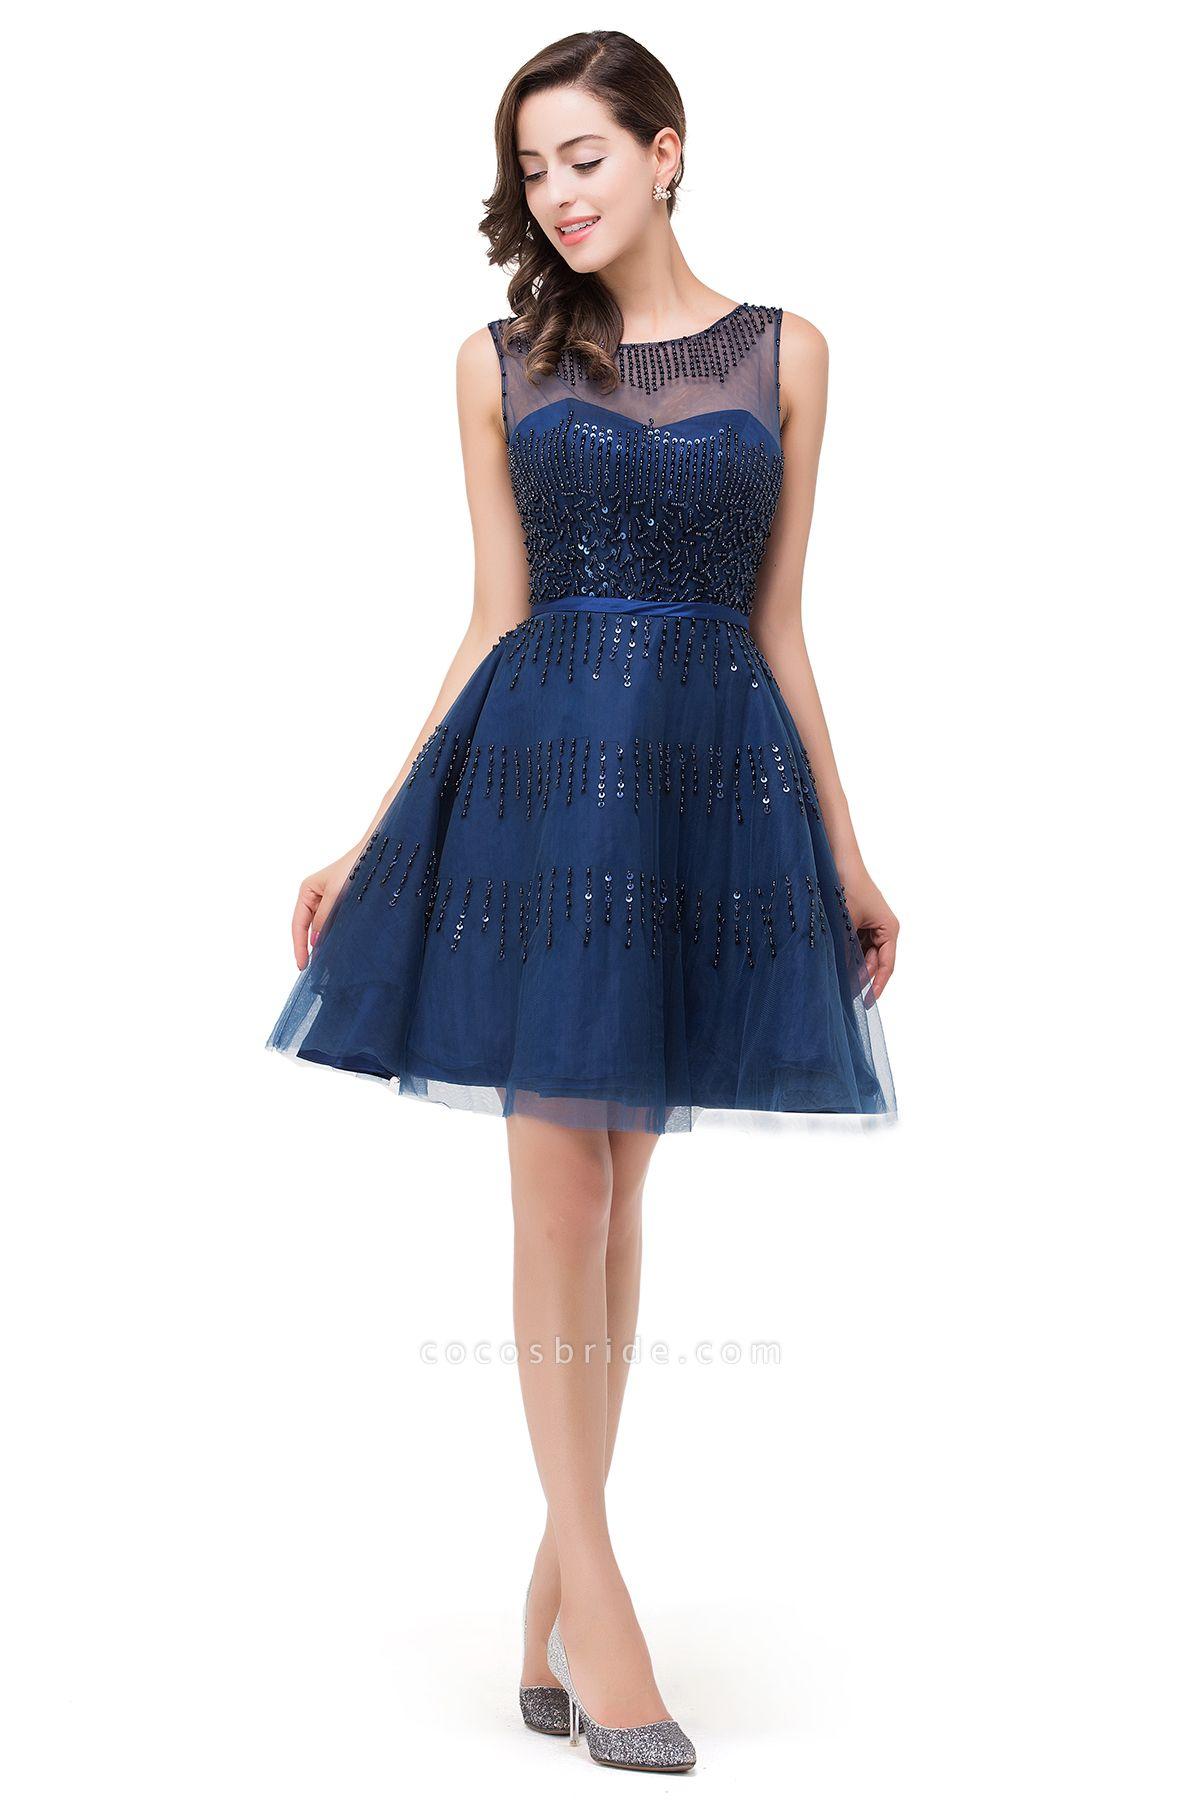 FATIMA | A-Line Sleeveless Crew Tulle Appliques Short Prom Dresses